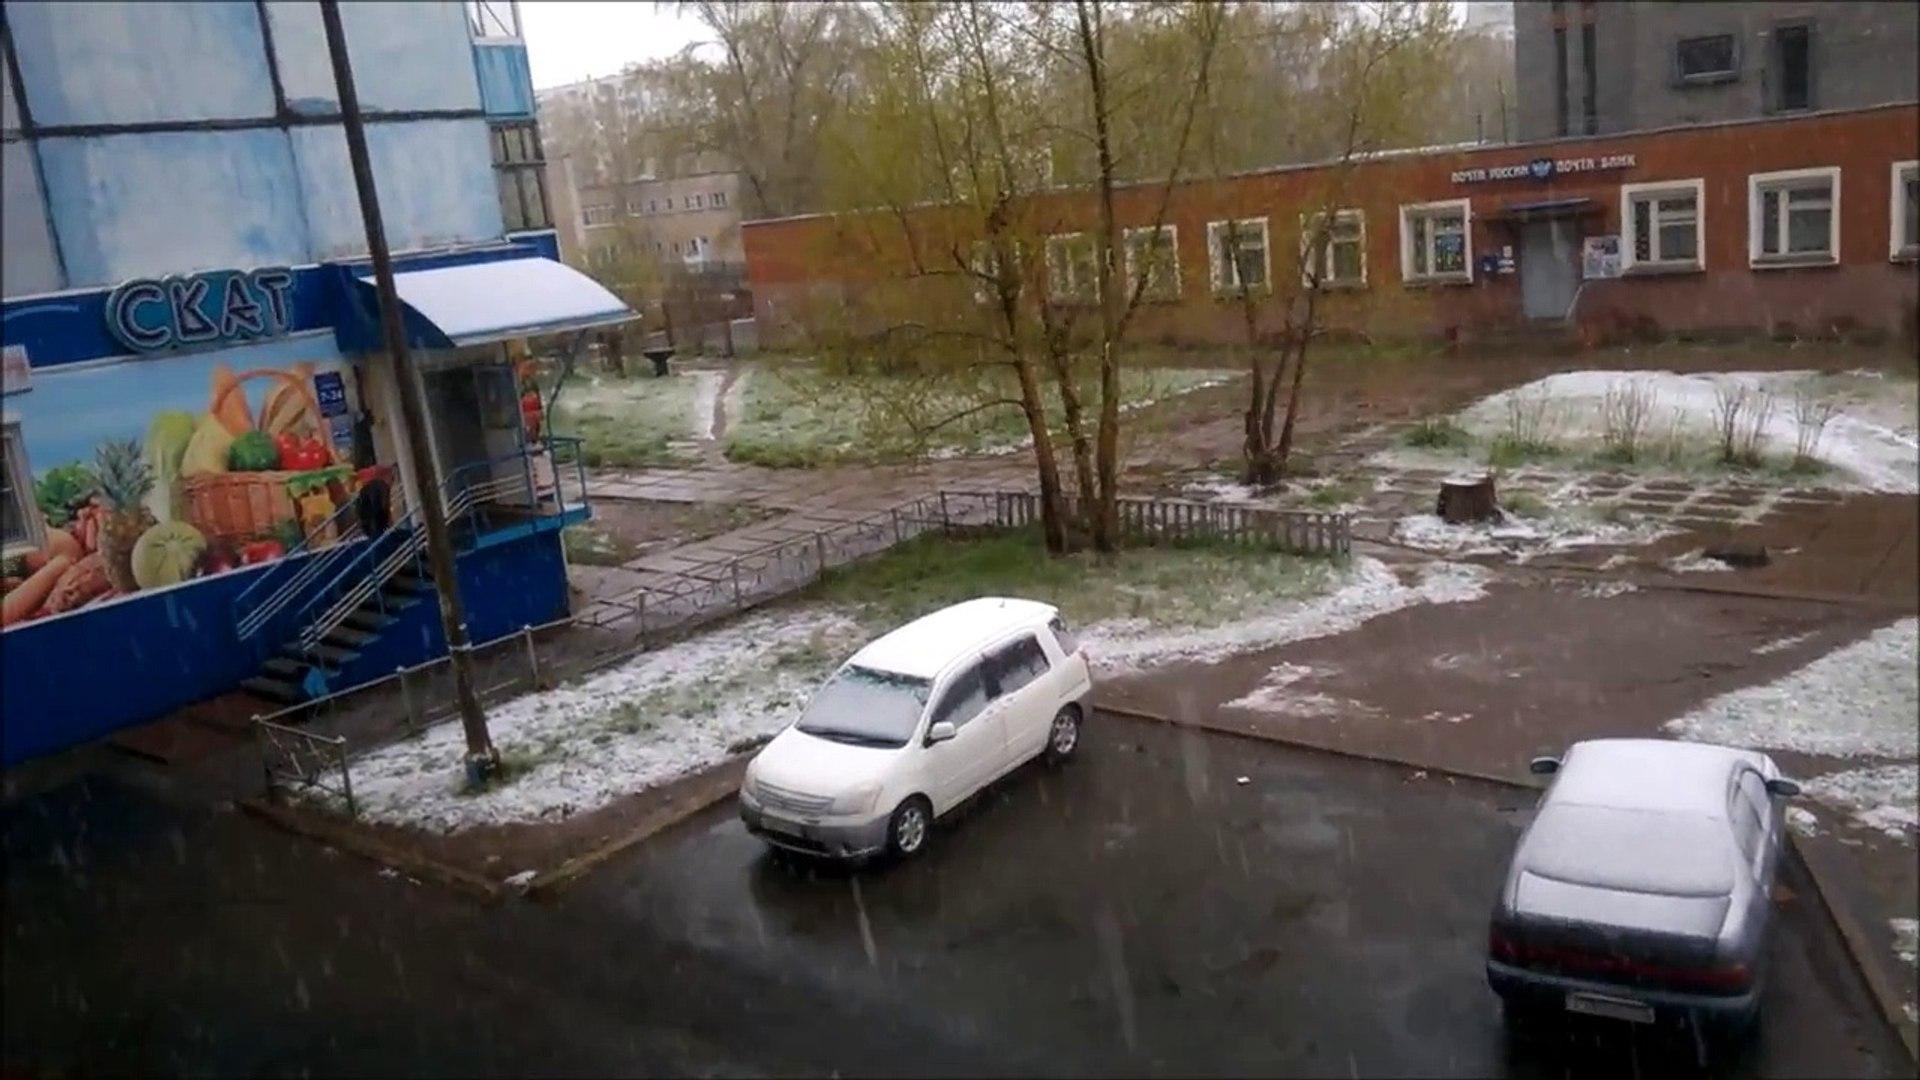 2018-05-20 Snow in May. Bratsk, Siberia, Russia Снег в мае Братск Сибирь Россия